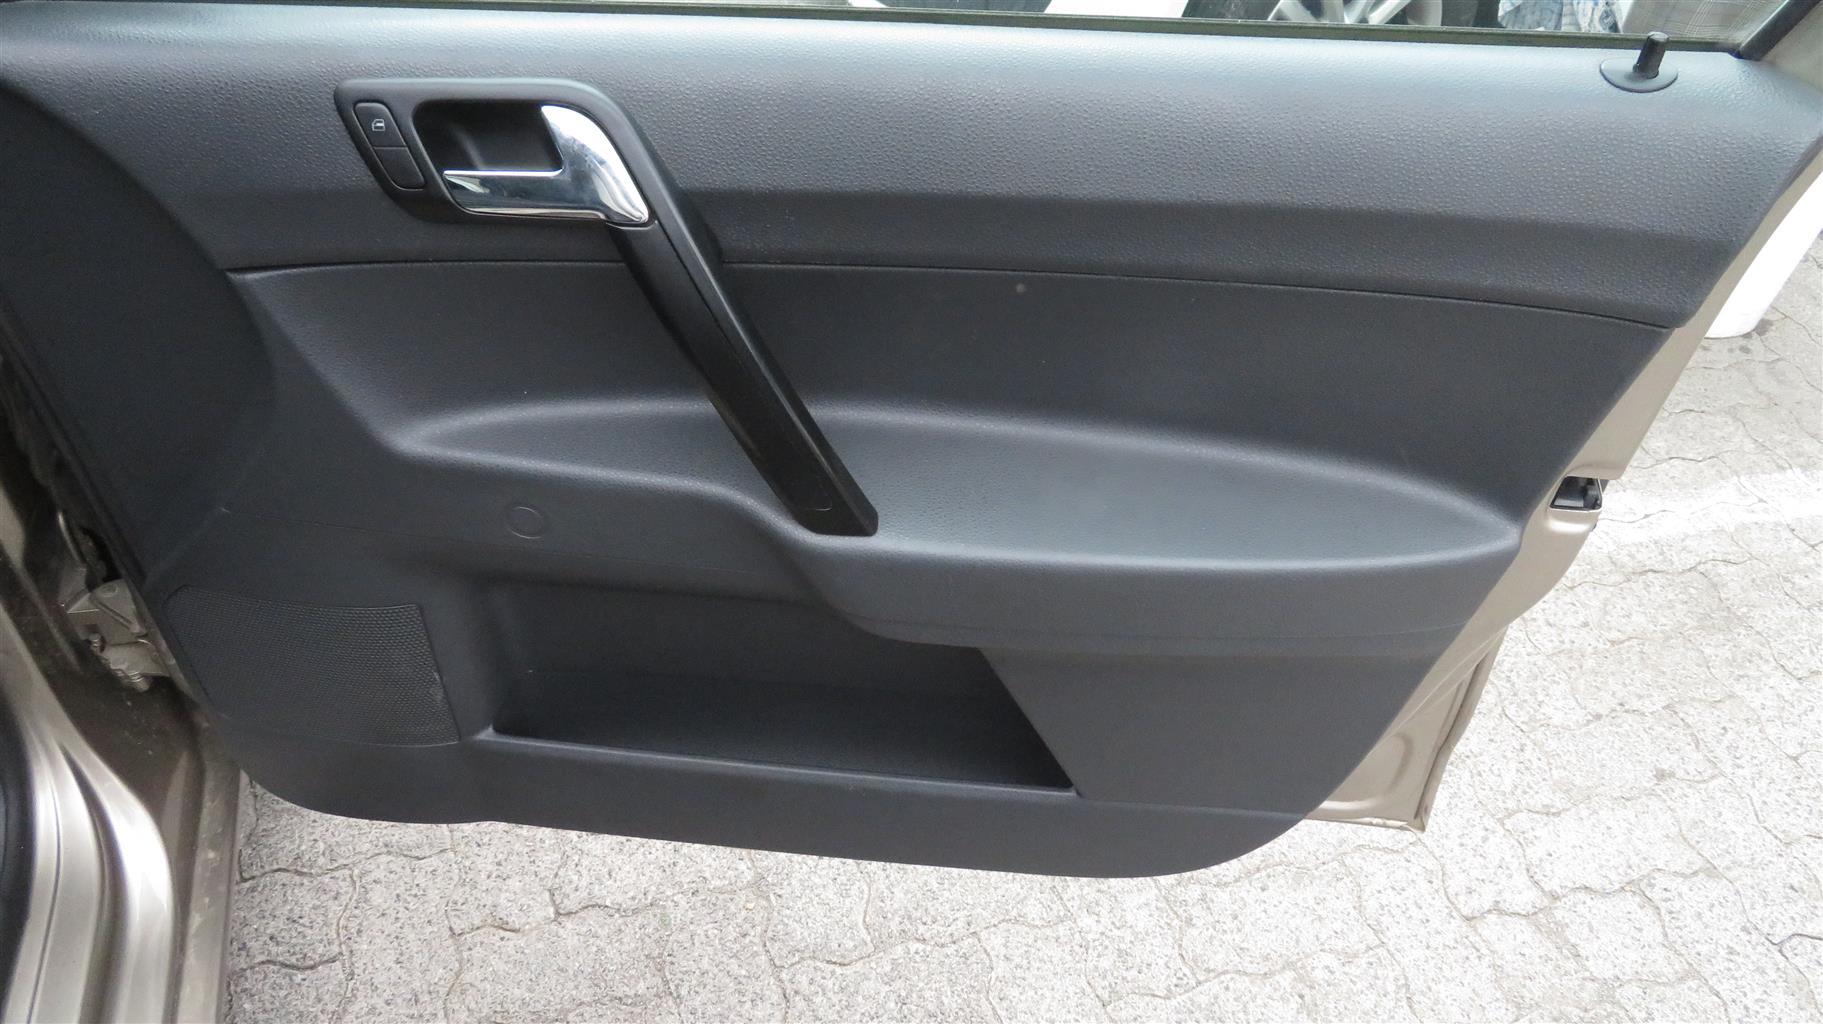 2014 VW Polo Vivo hatch 1.4 Conceptline